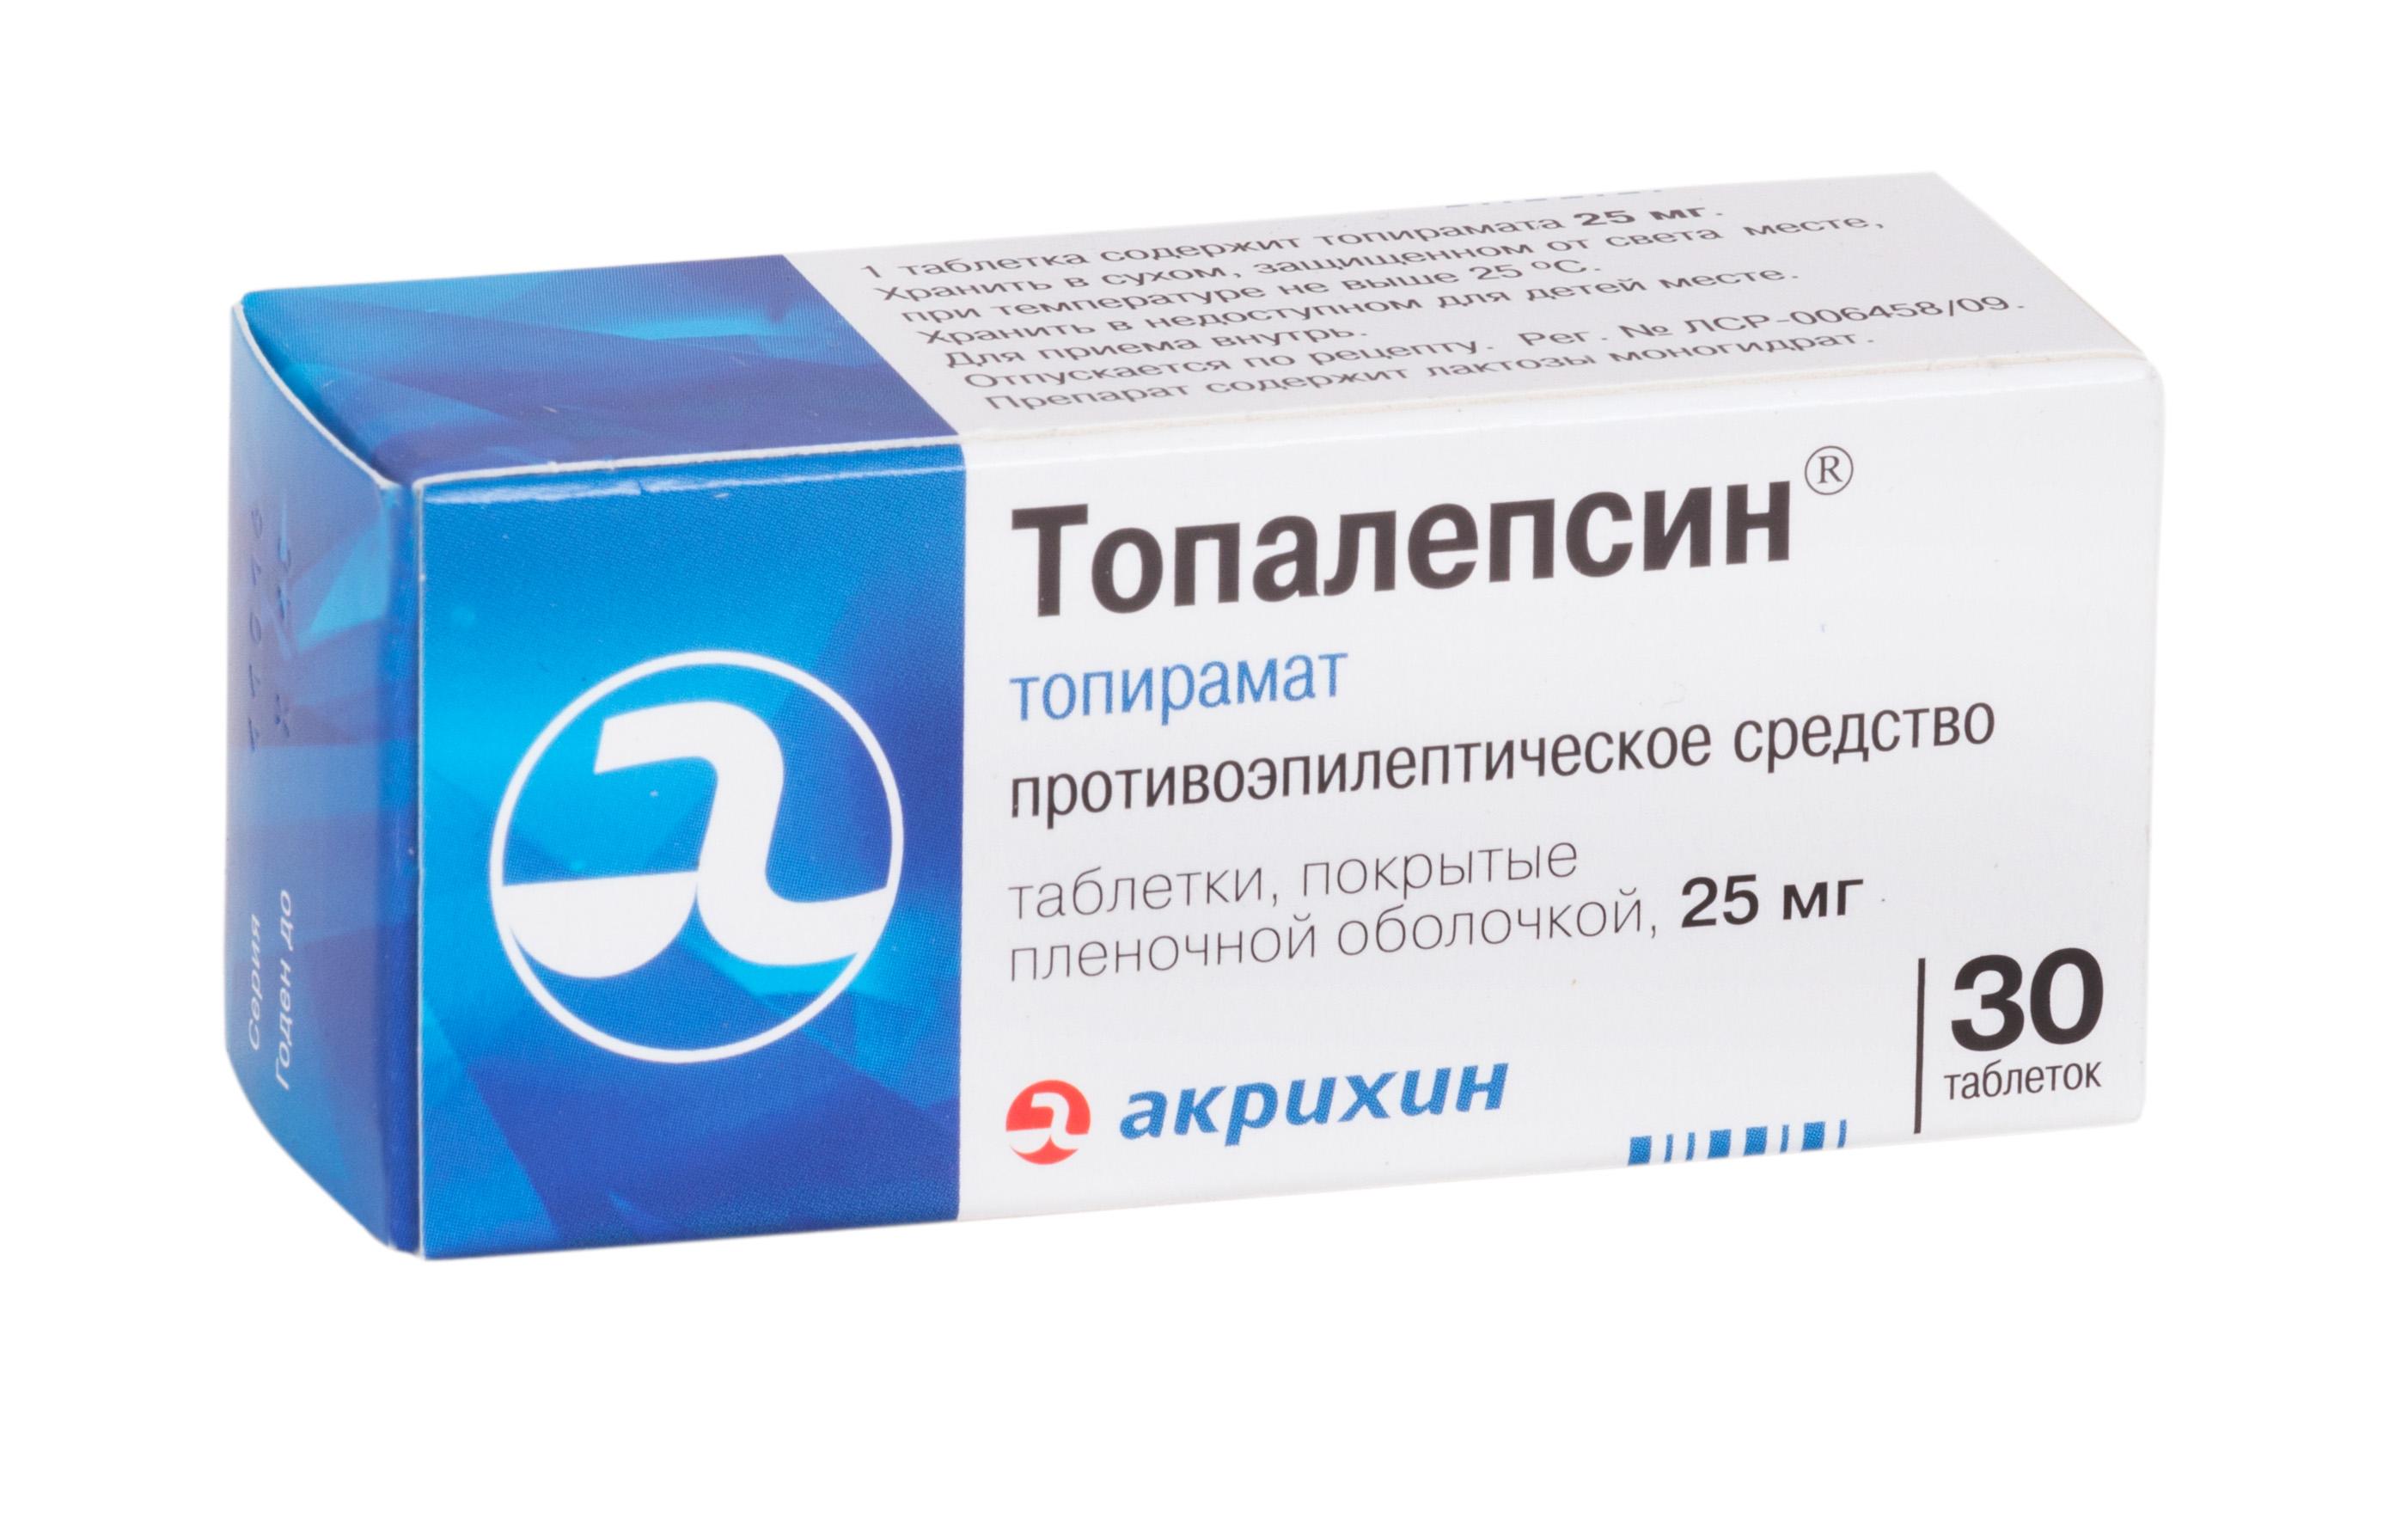 Топалепсин таб. п.п.о. 25мг n30